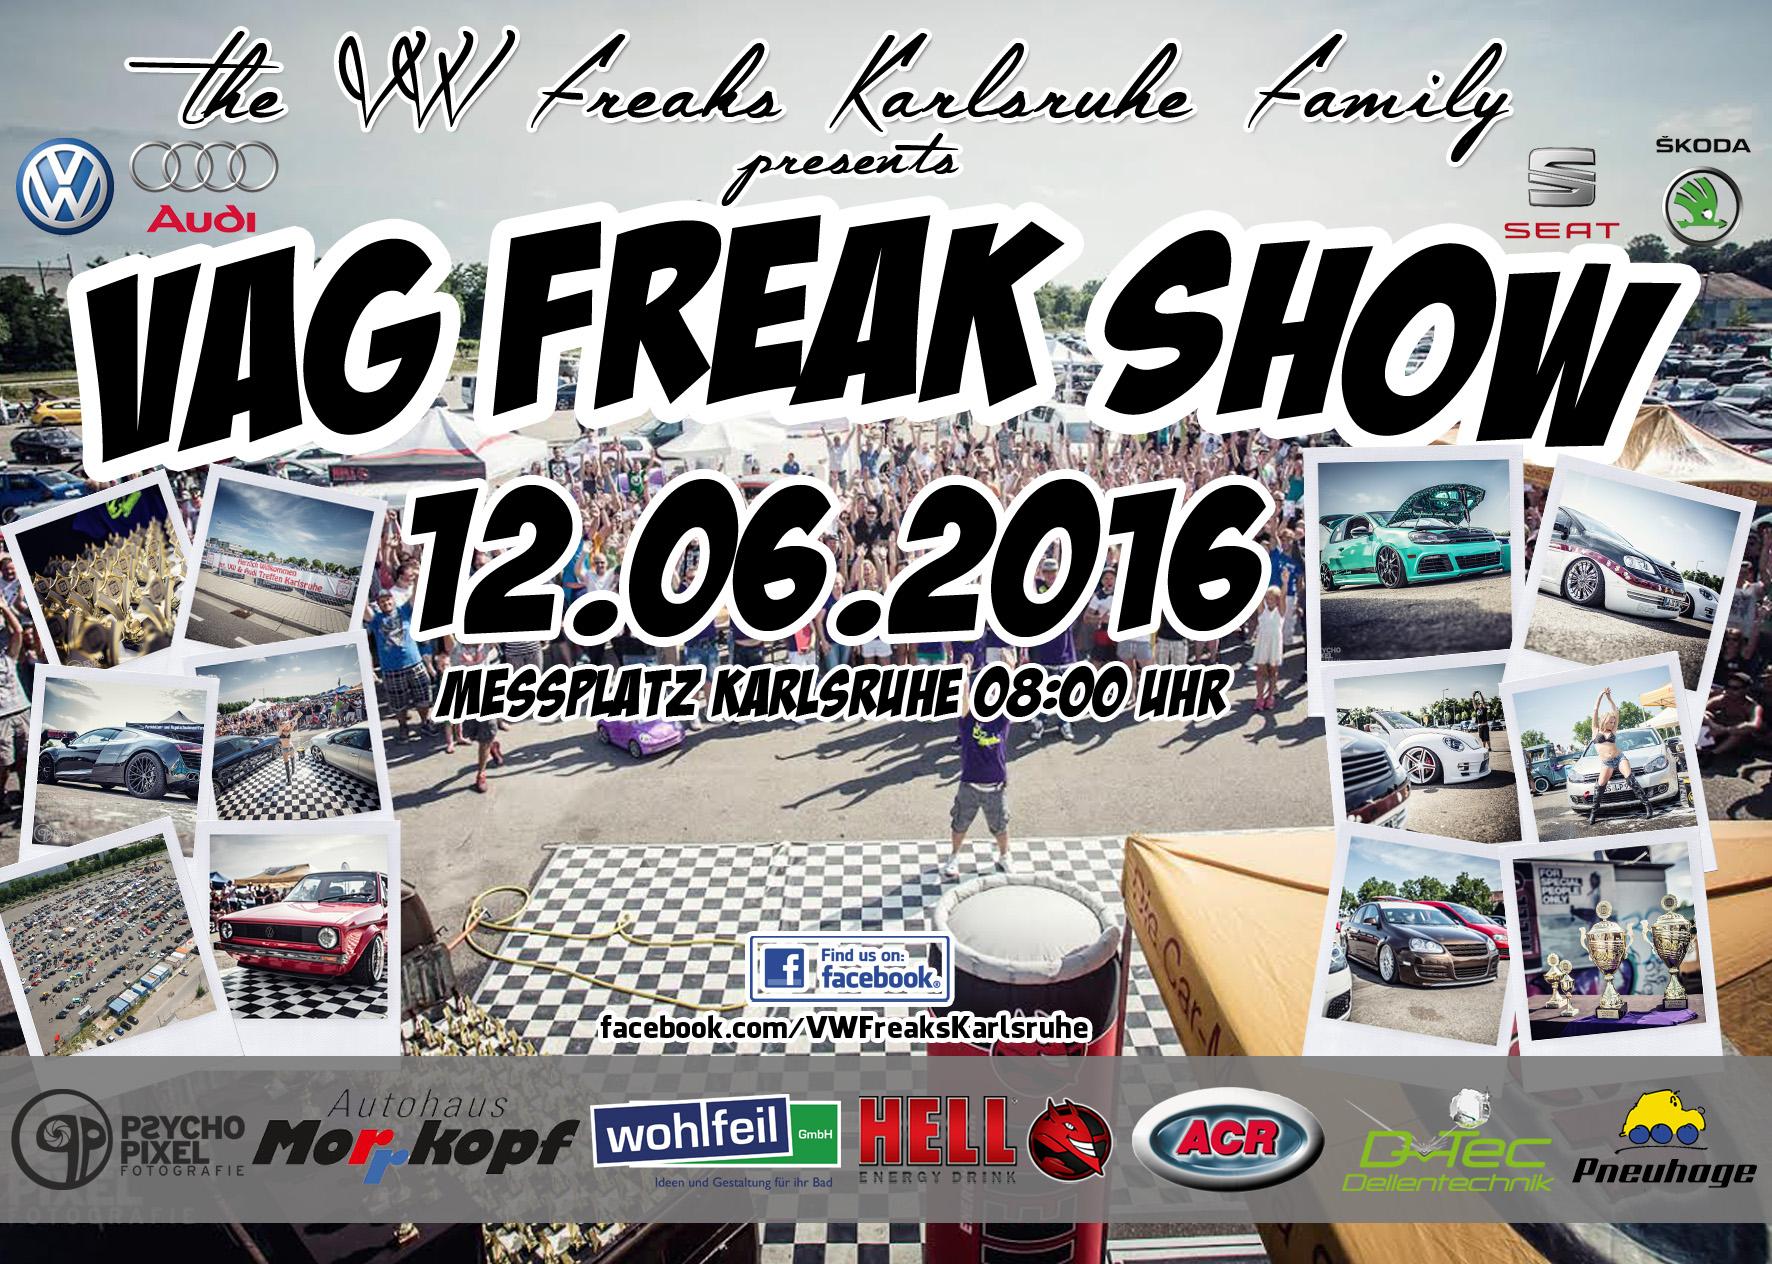 Unsere VAG Freak Show 2016